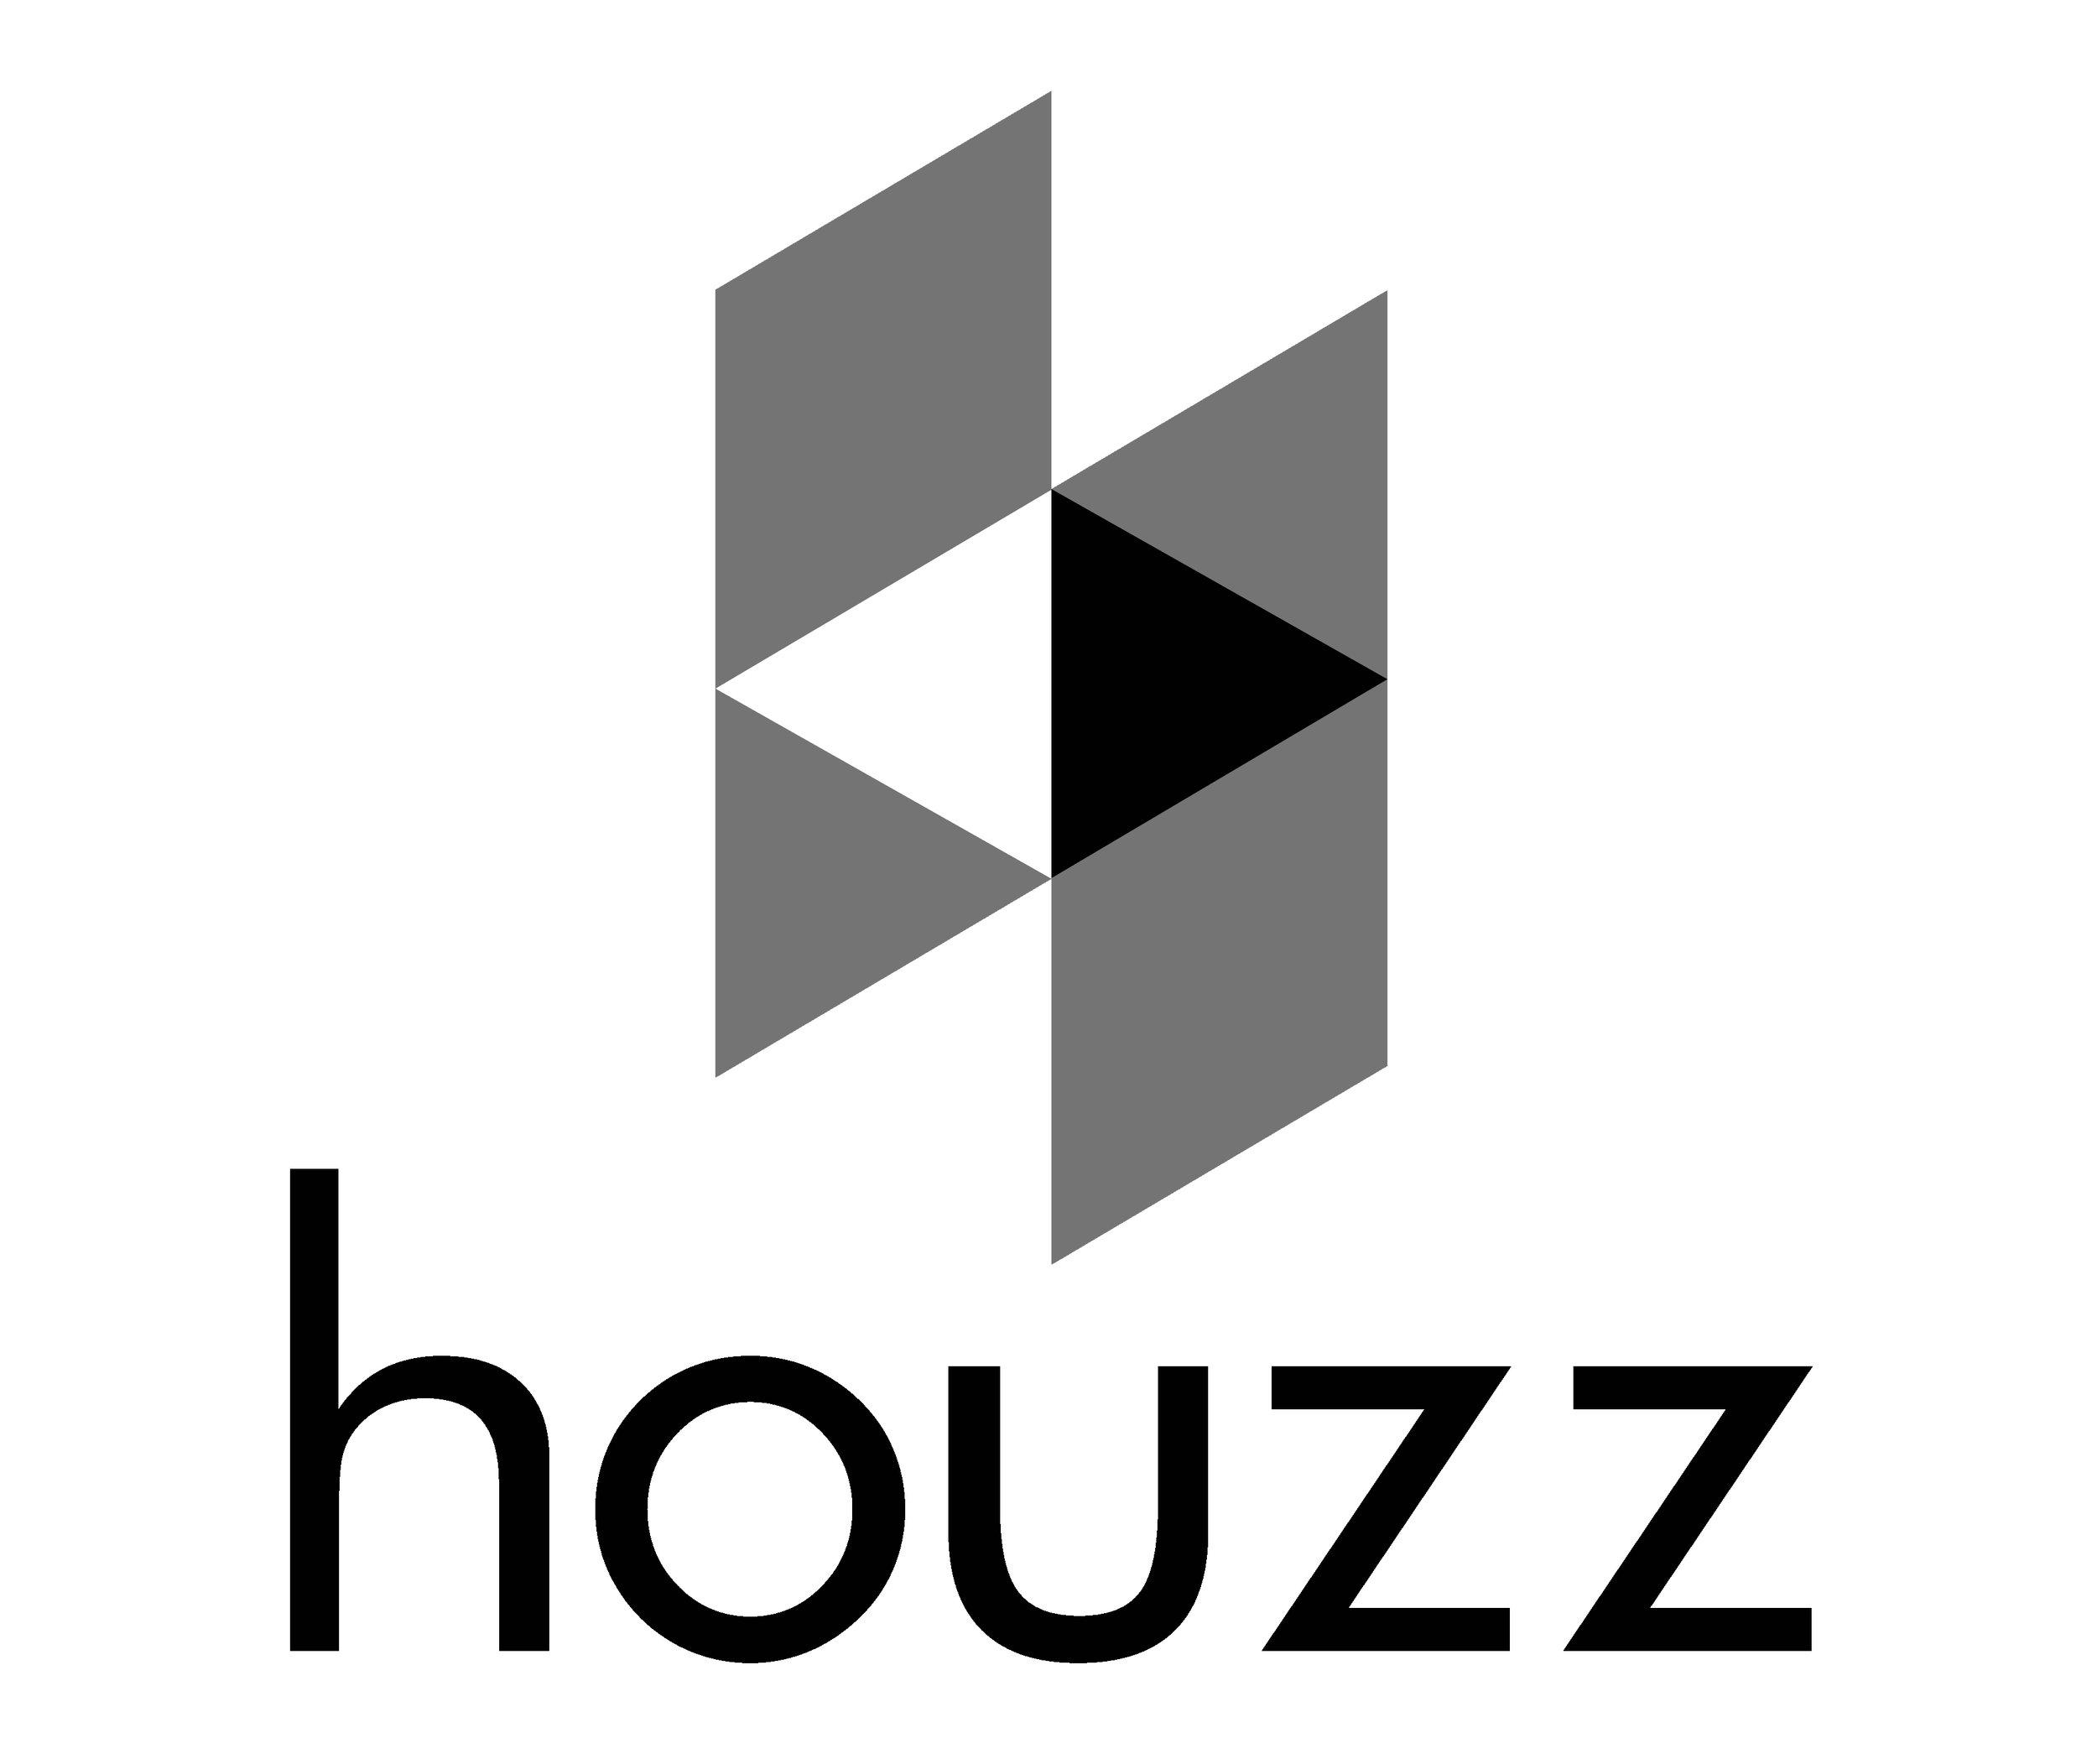 Houzz-emblem.jpg